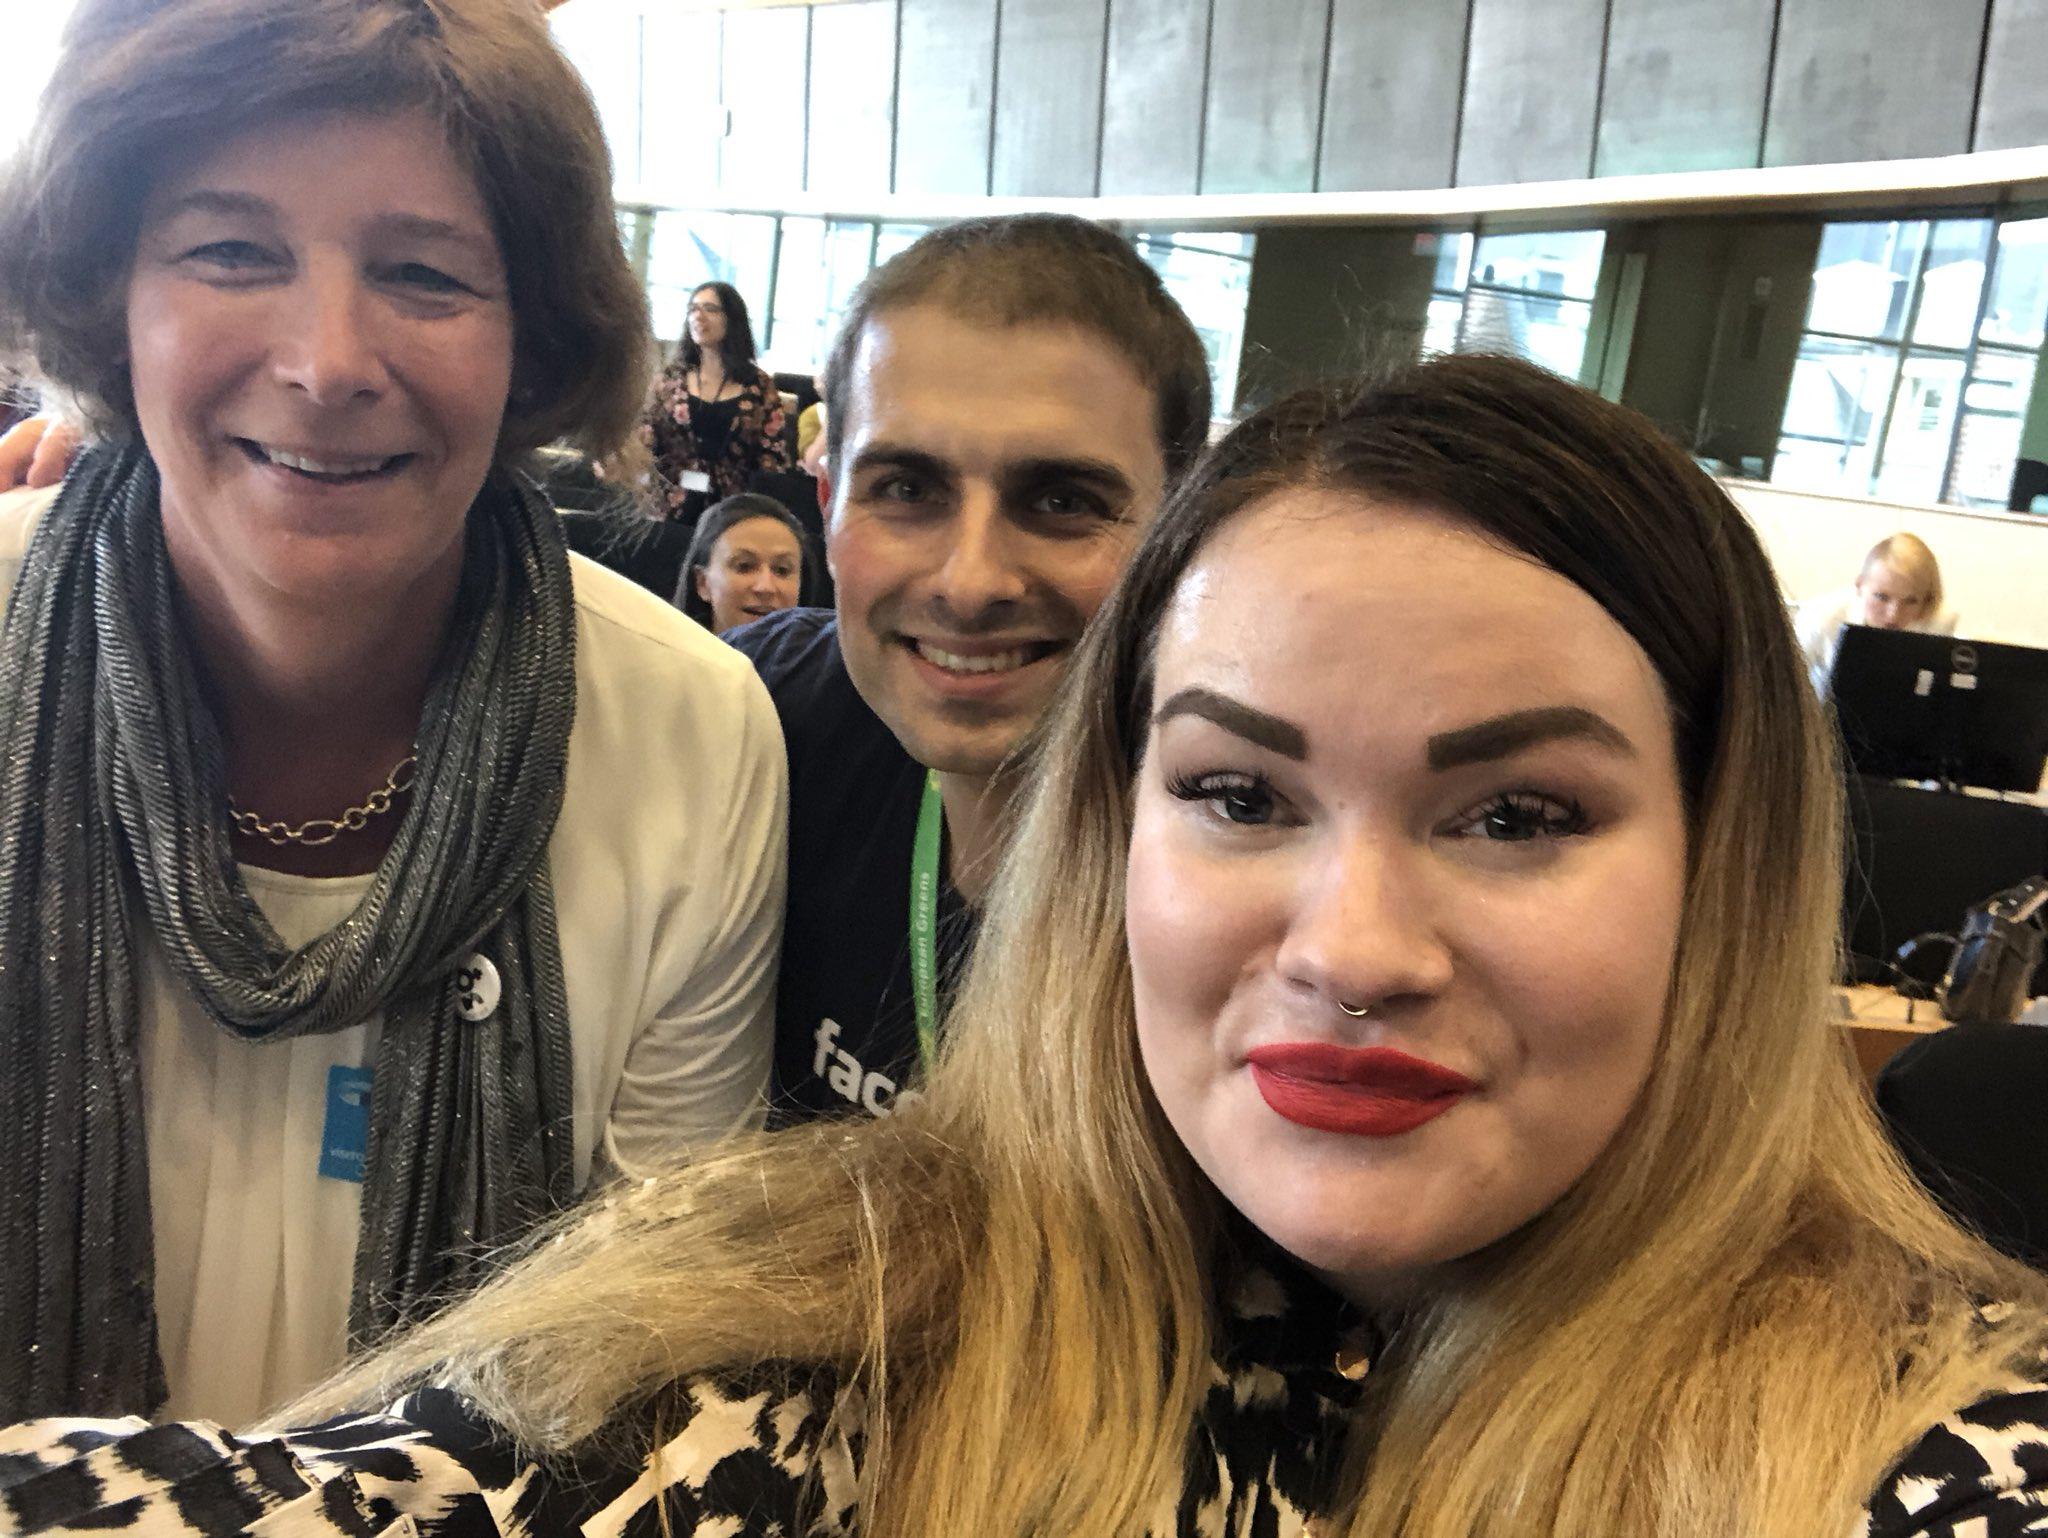 Petra De Sutter On Twitter Start Of Women re shaping Power In EP EuropeanWomen WomenforEurope ojala annika Komrakov europeangreens Https t co aNmaP L ZZ